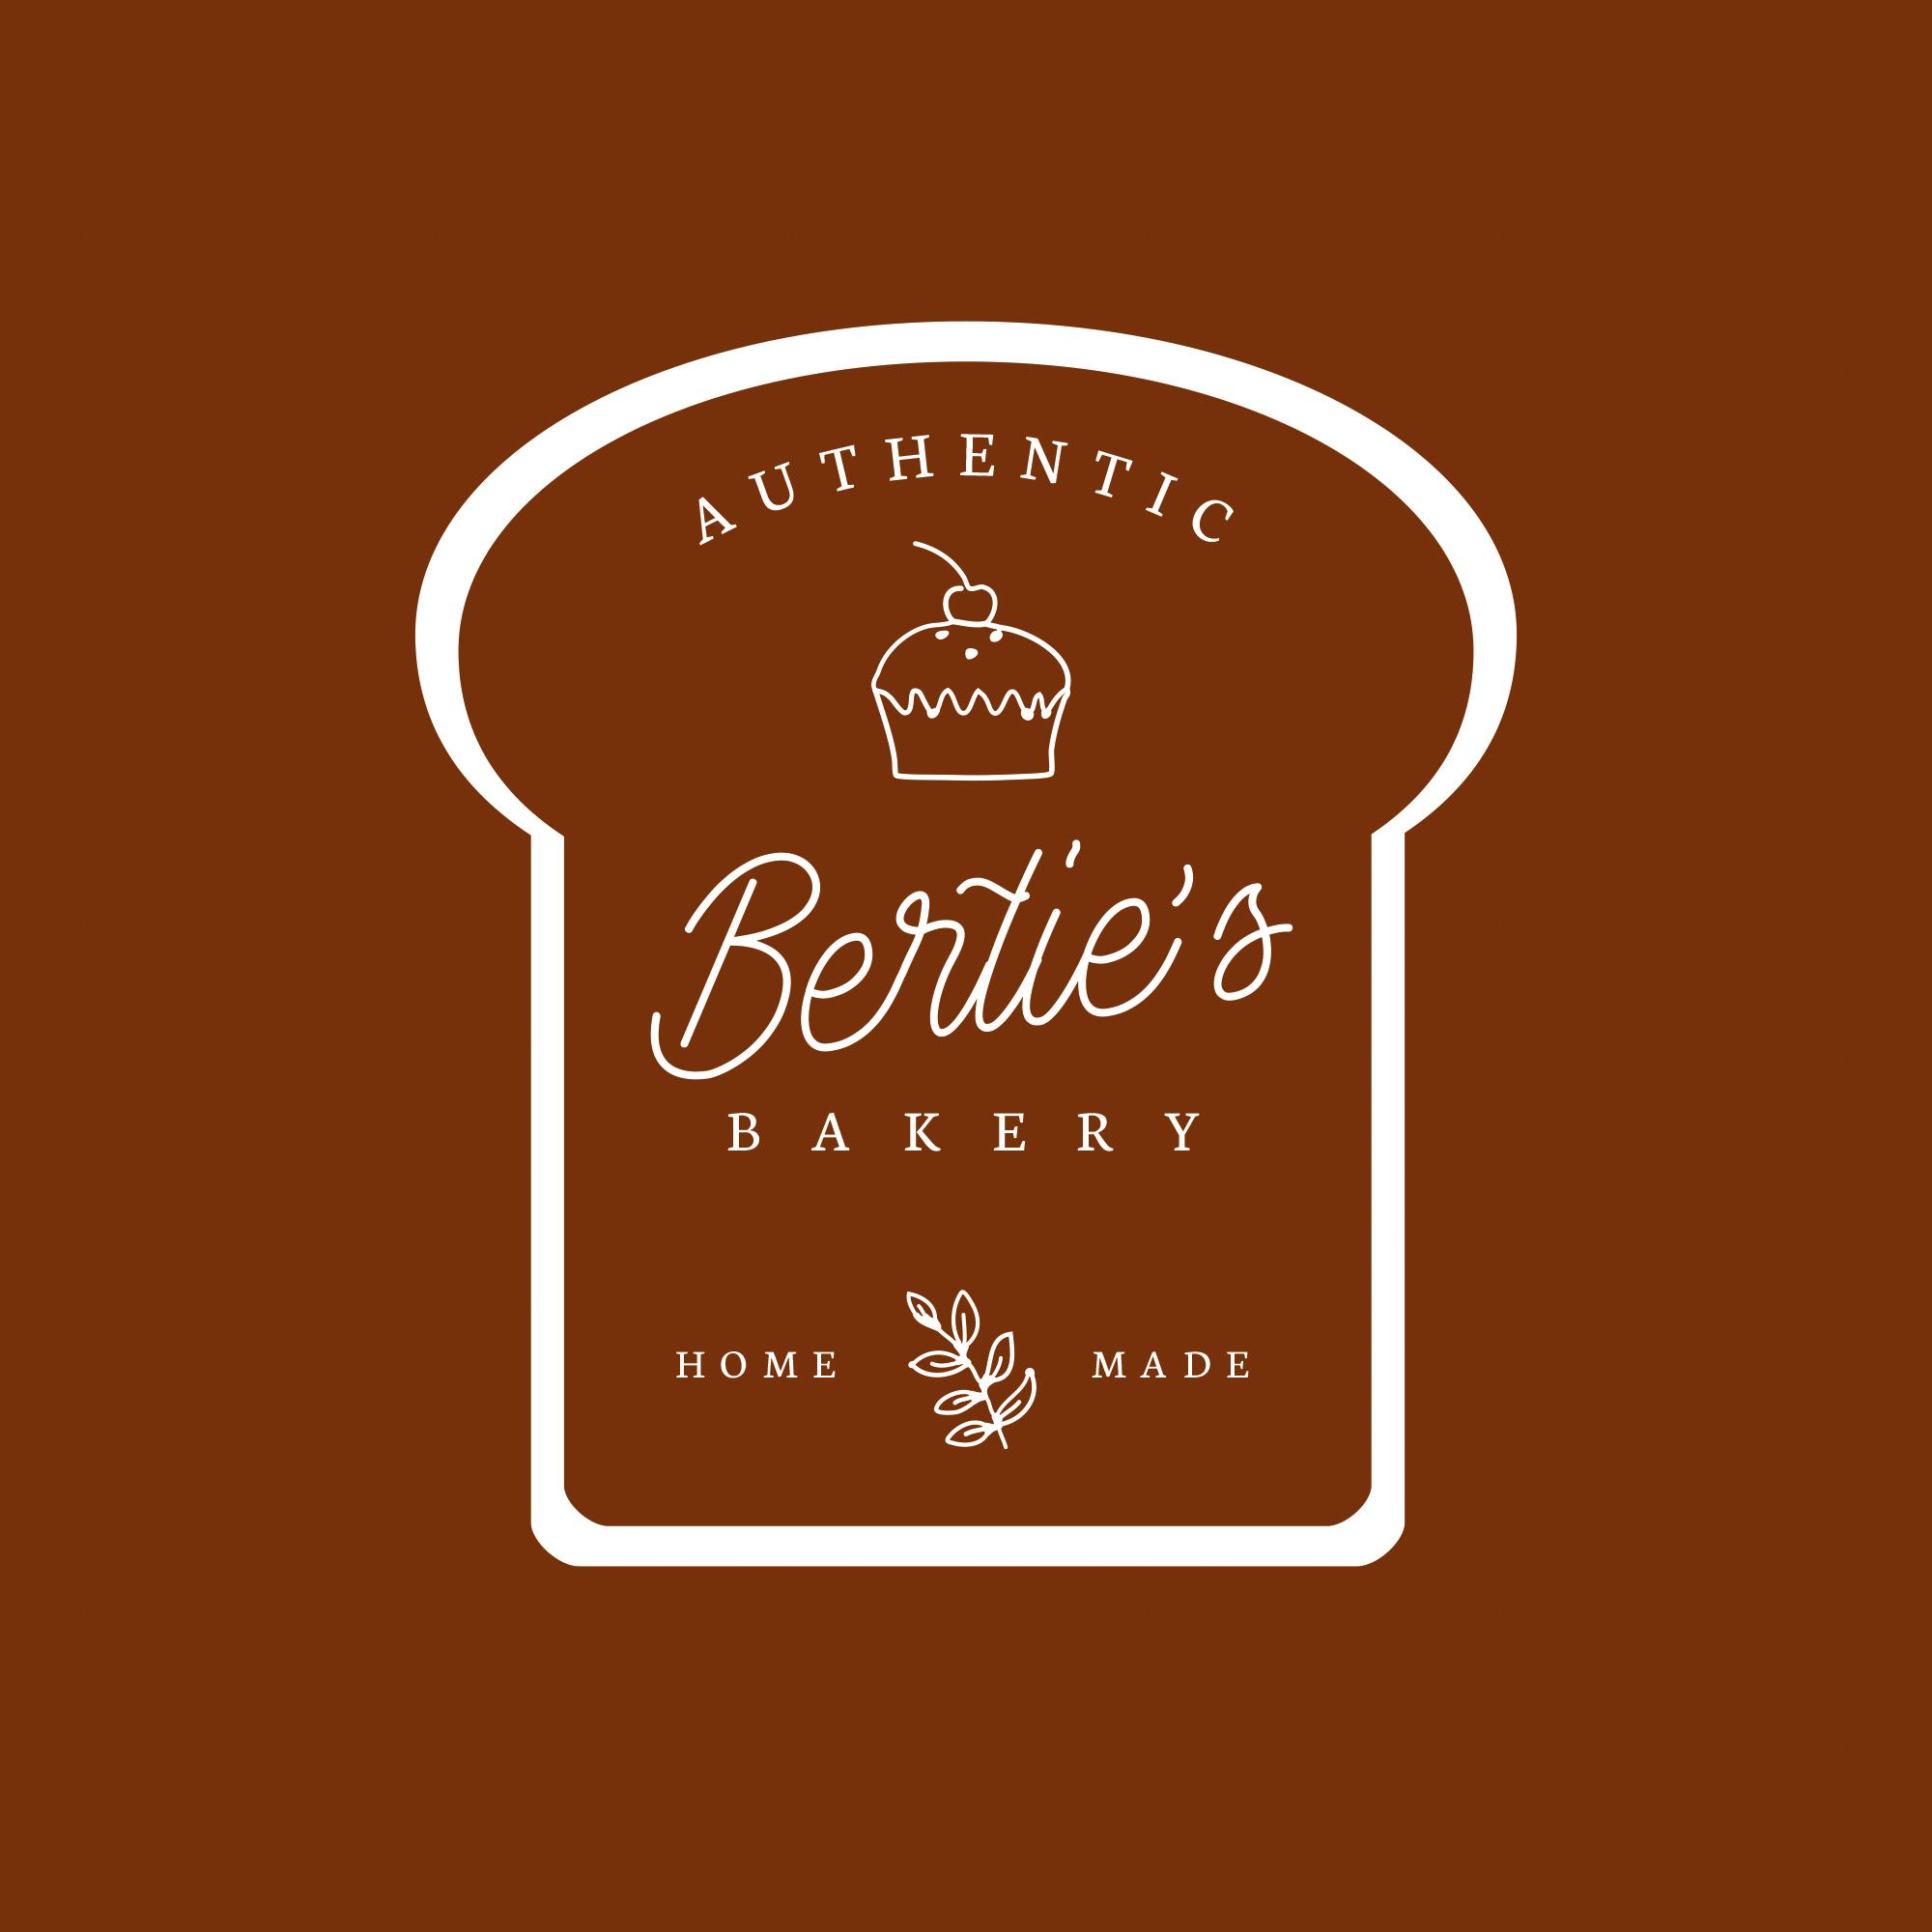 Bertie's Bakery Premade Logo